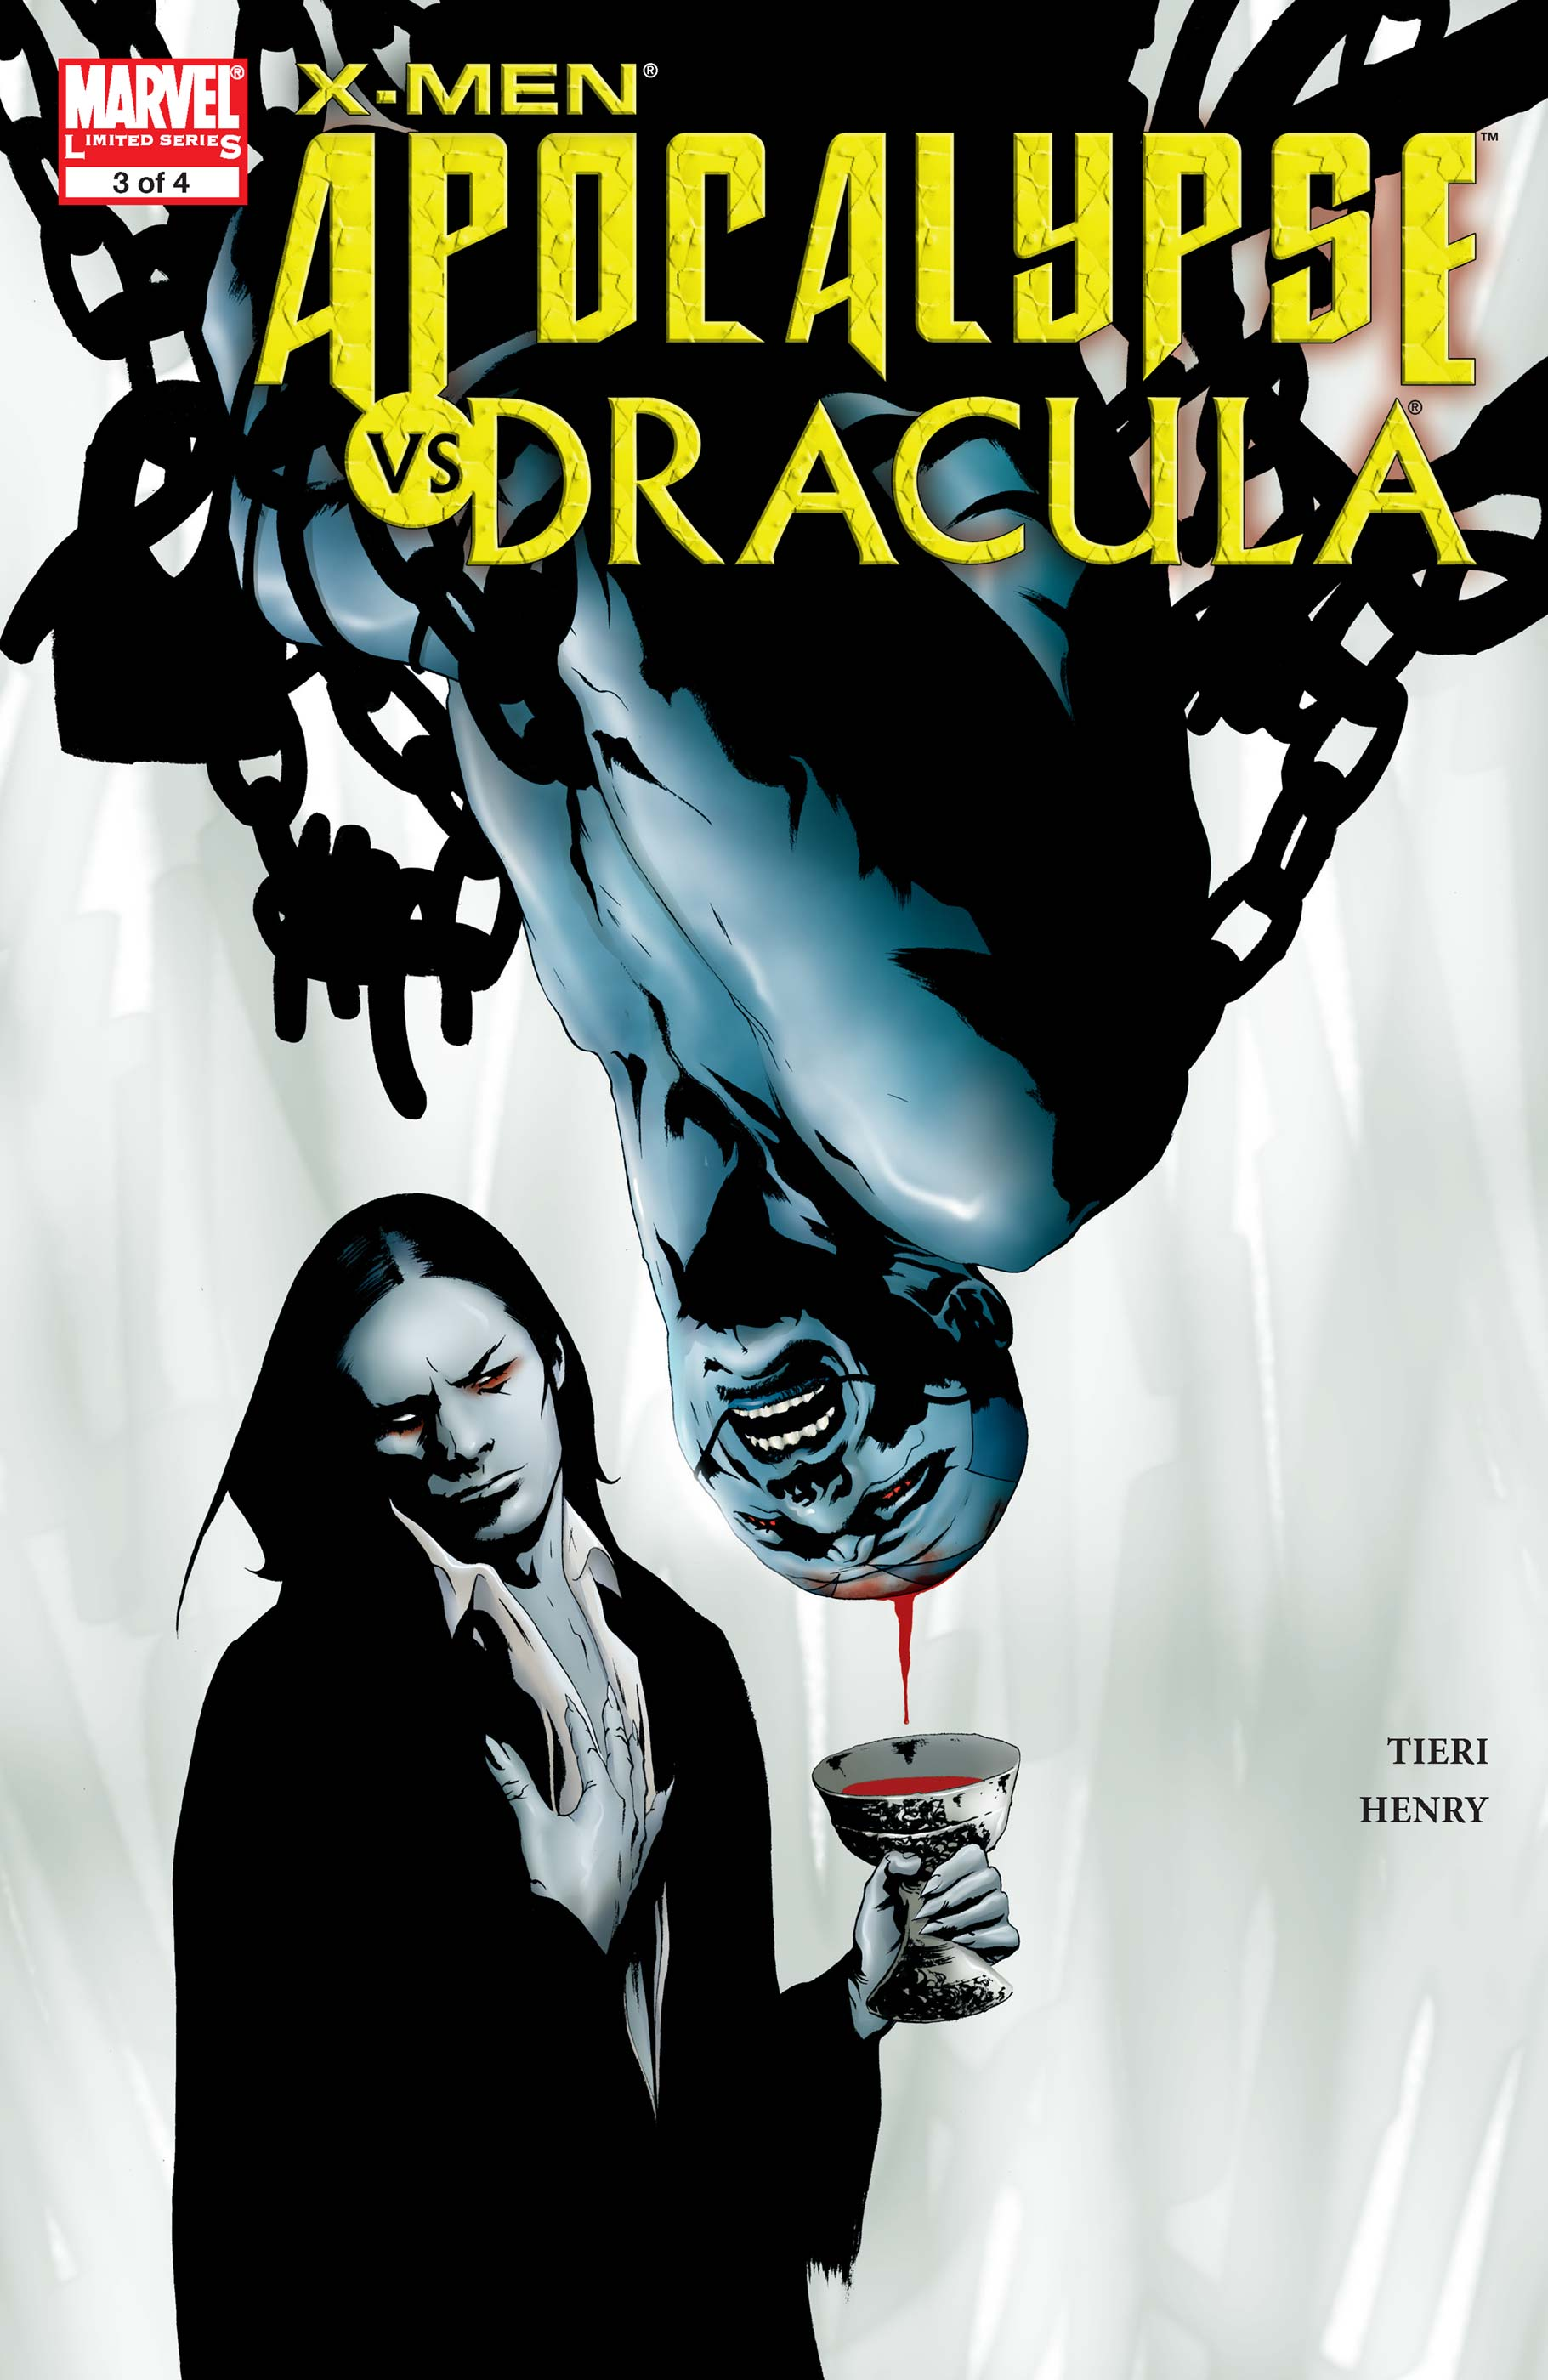 X-Men: Apocalypse/Dracula (2006) #3